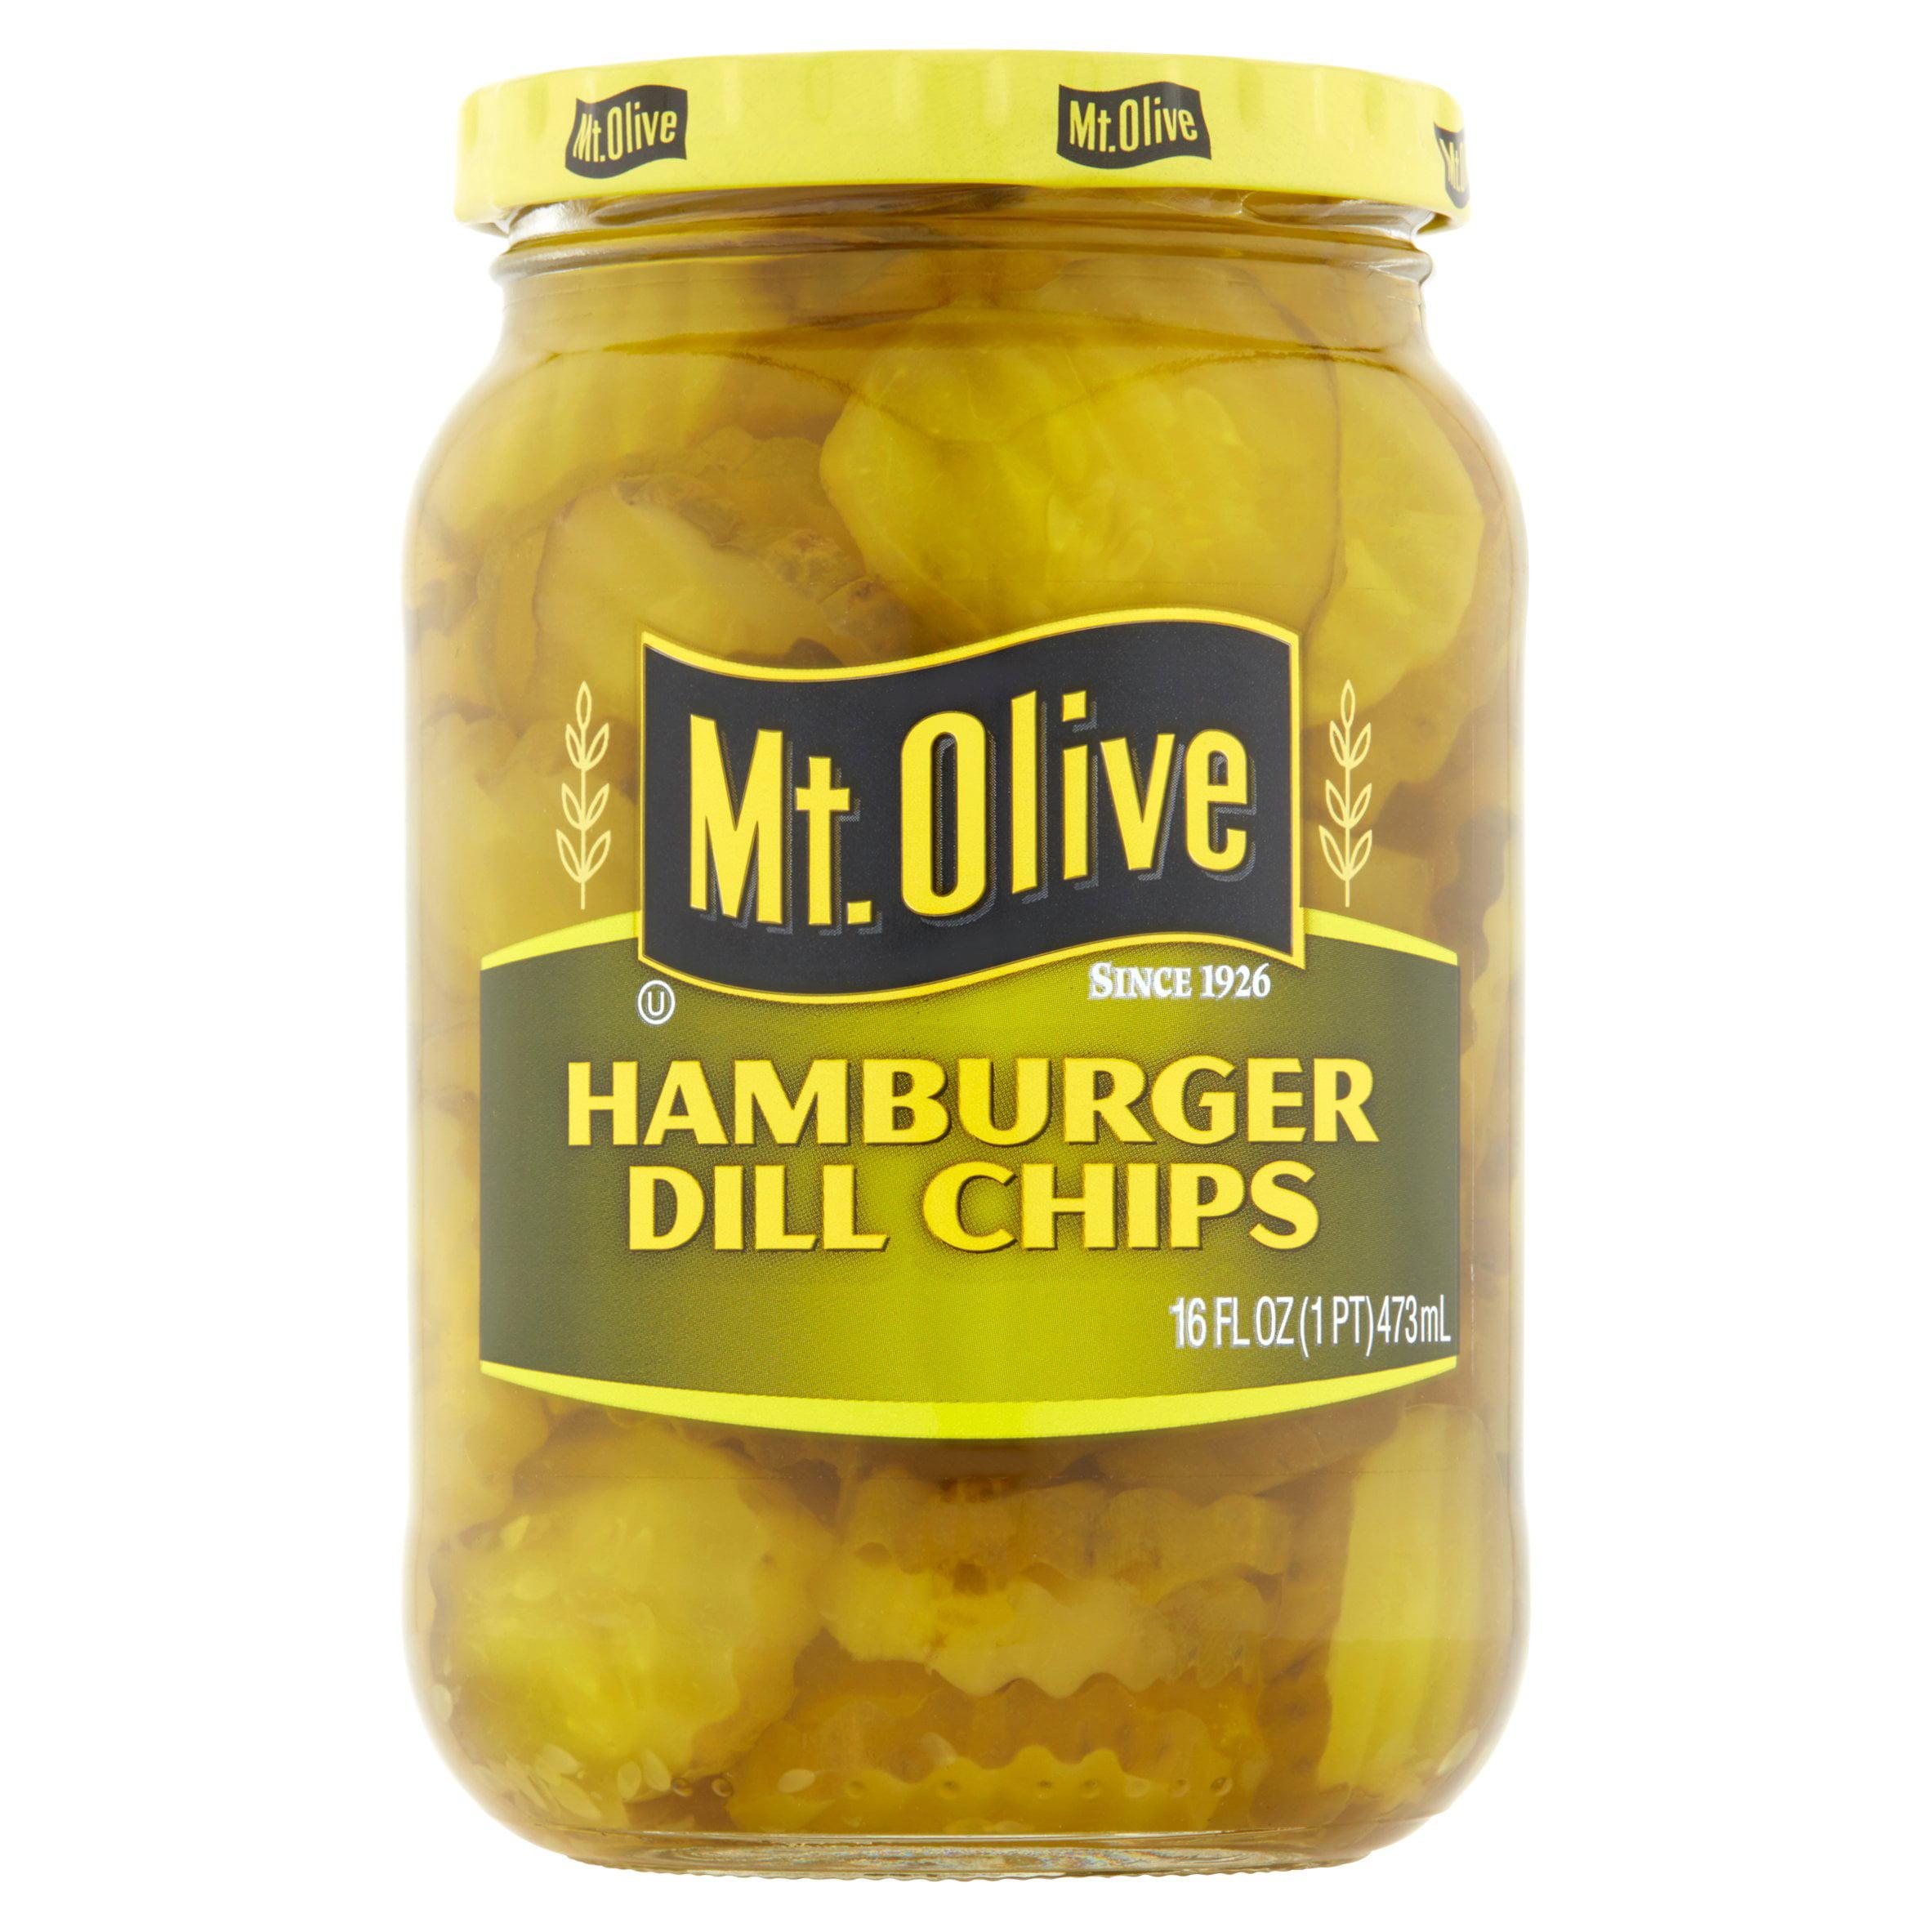 Mt. Olive Hamburger Dill Chips Pickles 16 fl. oz. Jar by Corner of Cucumber and Vine